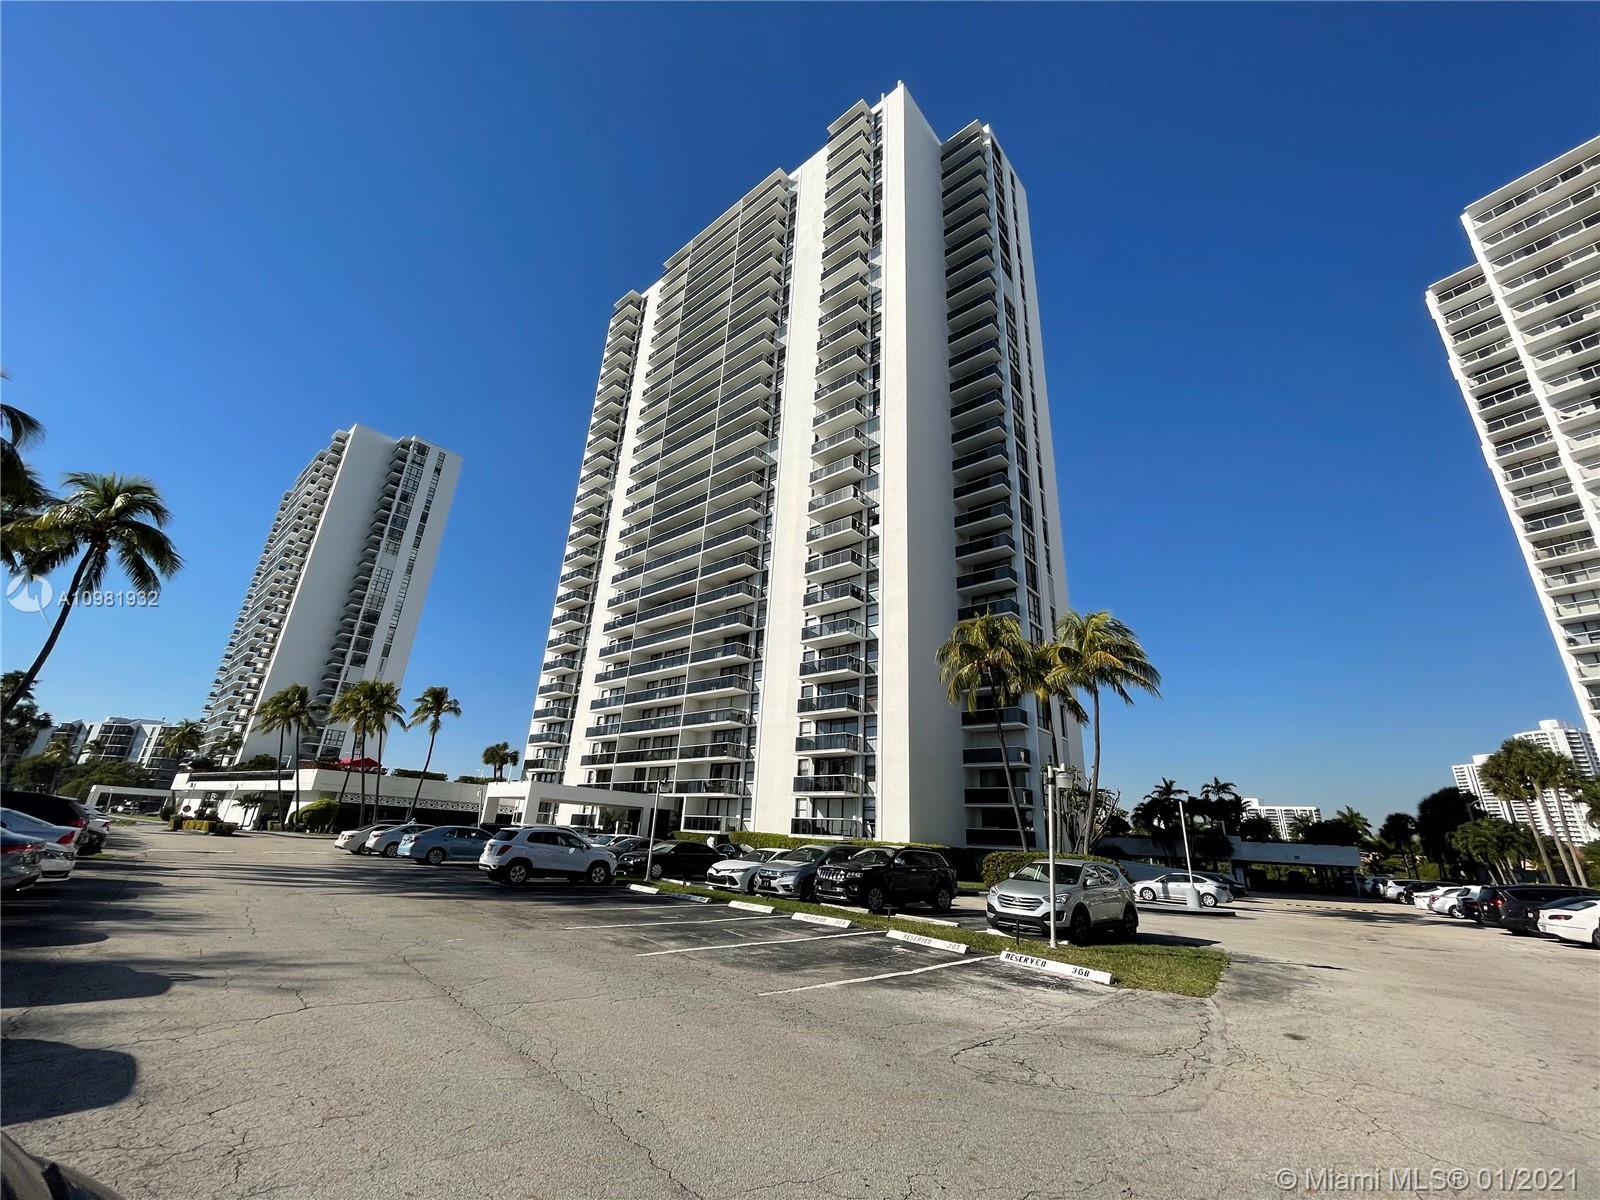 Eldorado Tower One #1210 - 3625 N Country Club Dr #1210, Aventura, FL 33180